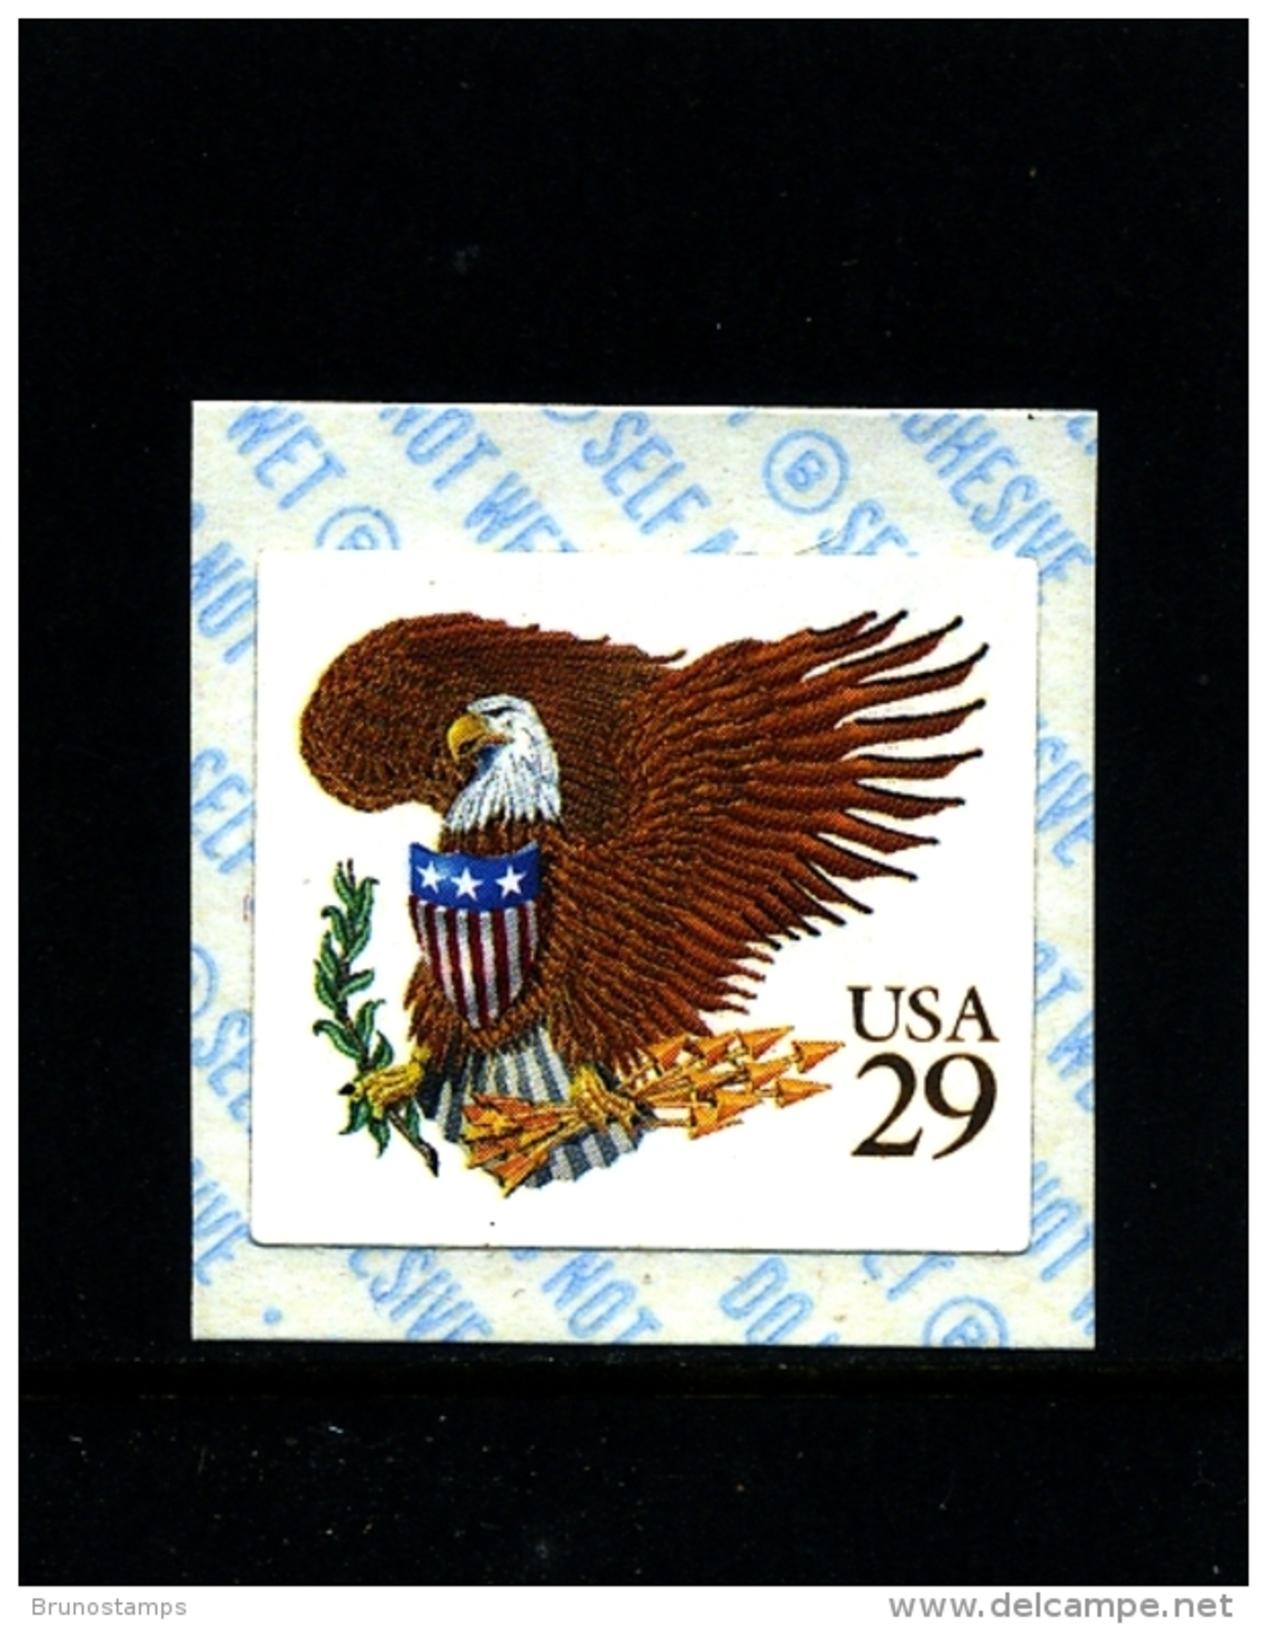 UNITED STATES/USA - 1992  29c  EAGLE  (BROWN)  SELF ADHESIVE MINT NH - Stati Uniti